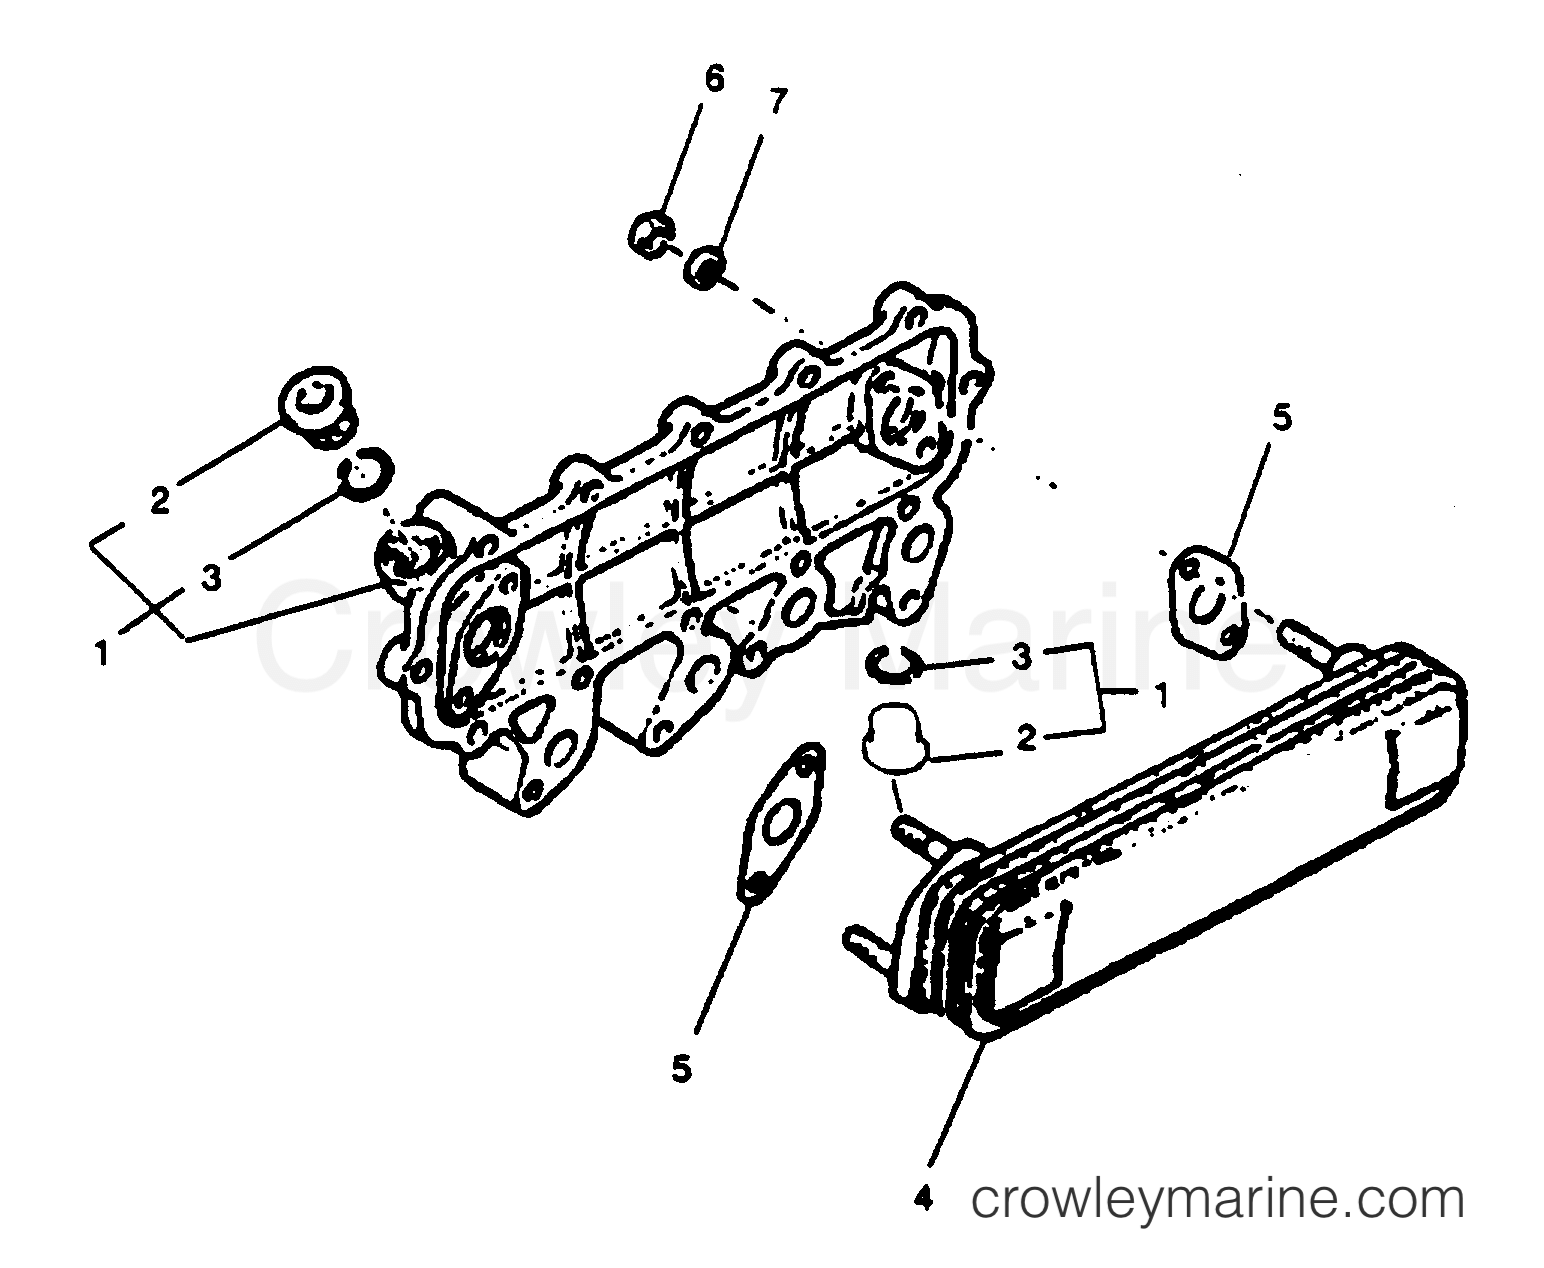 Oil Cooler Assembly